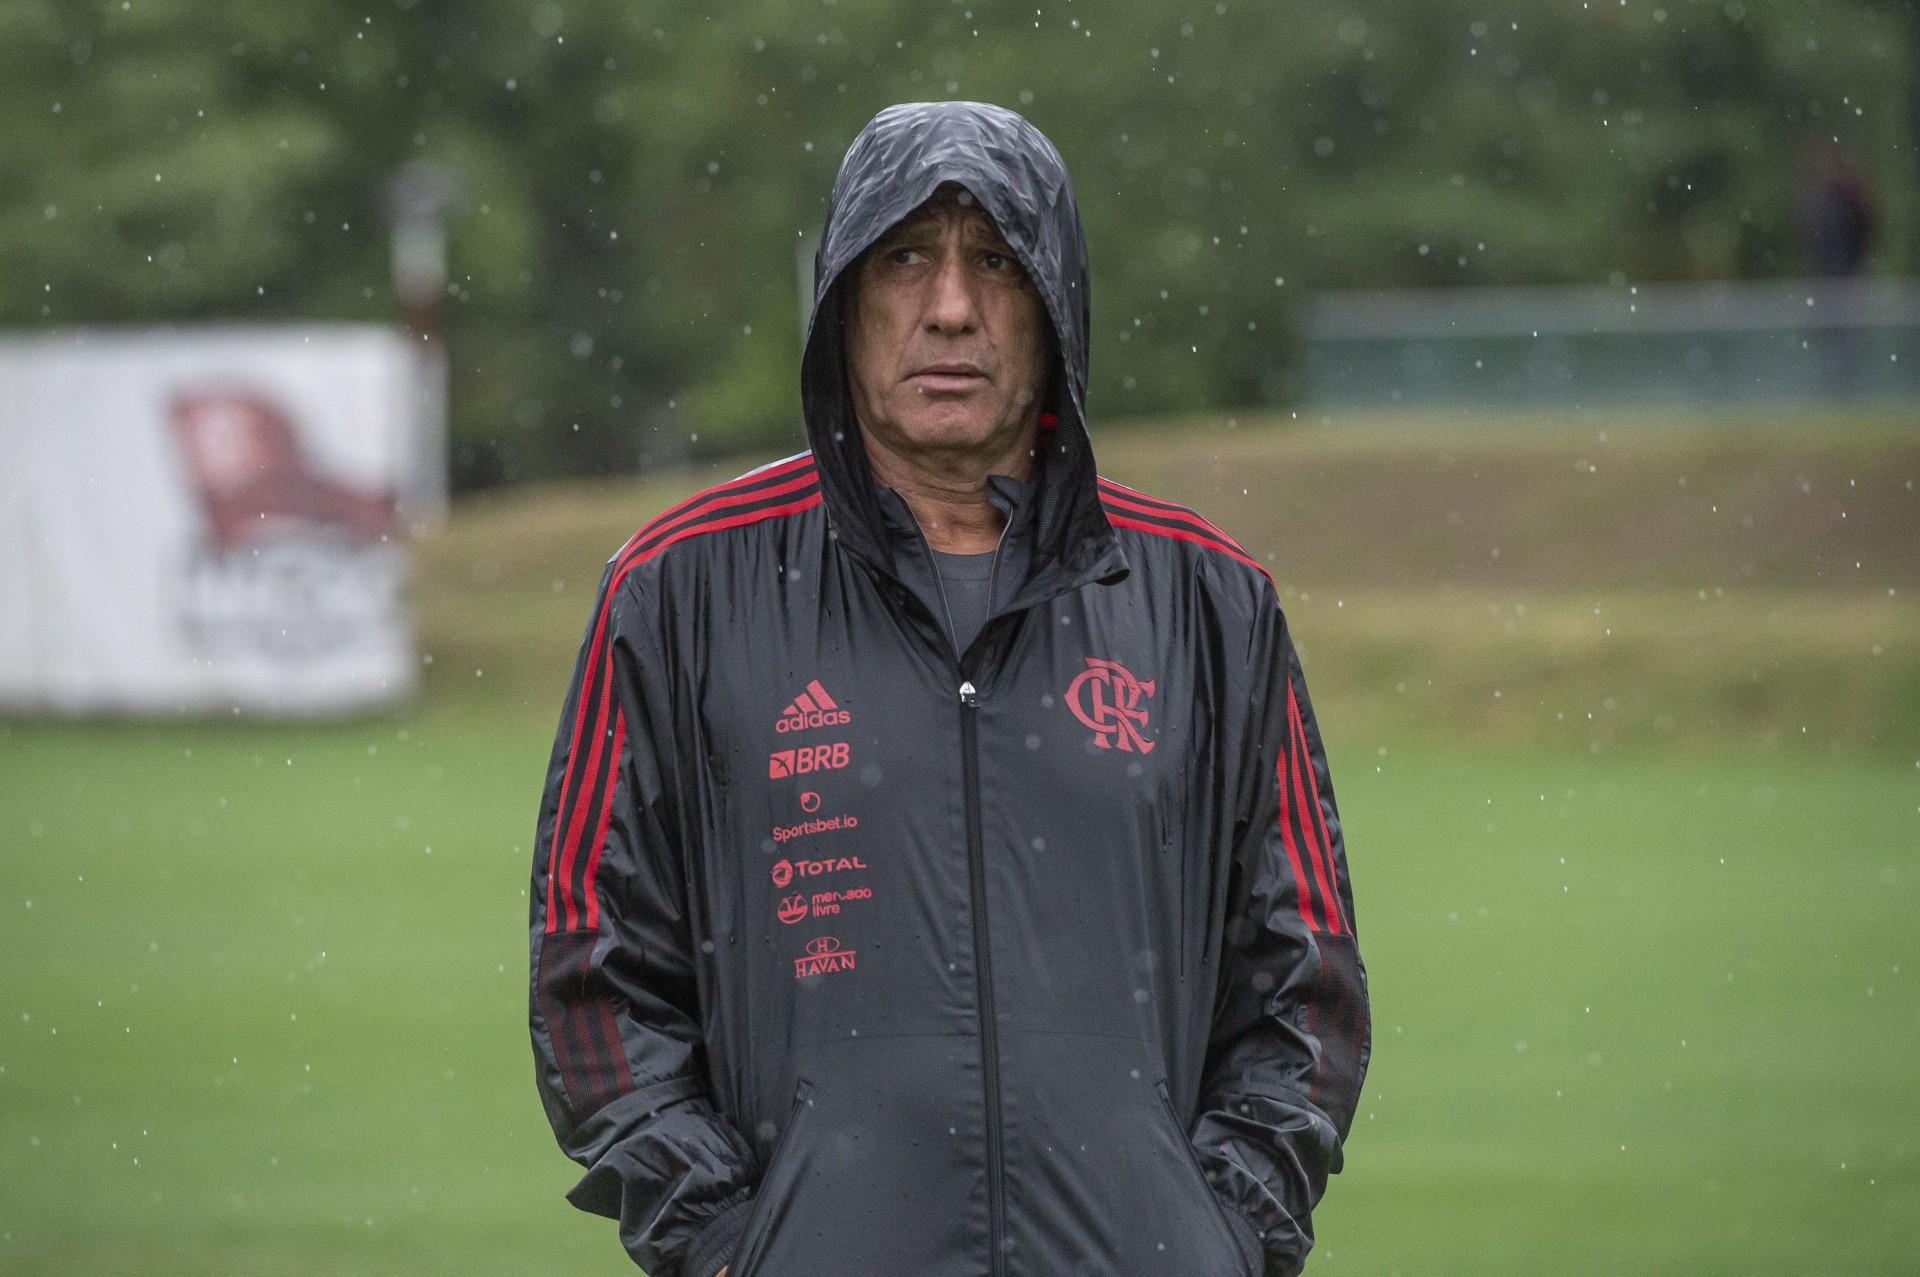 Renato esboça Flamengo para enfrentar o Fluminense pelo Campeonato Brasileiro